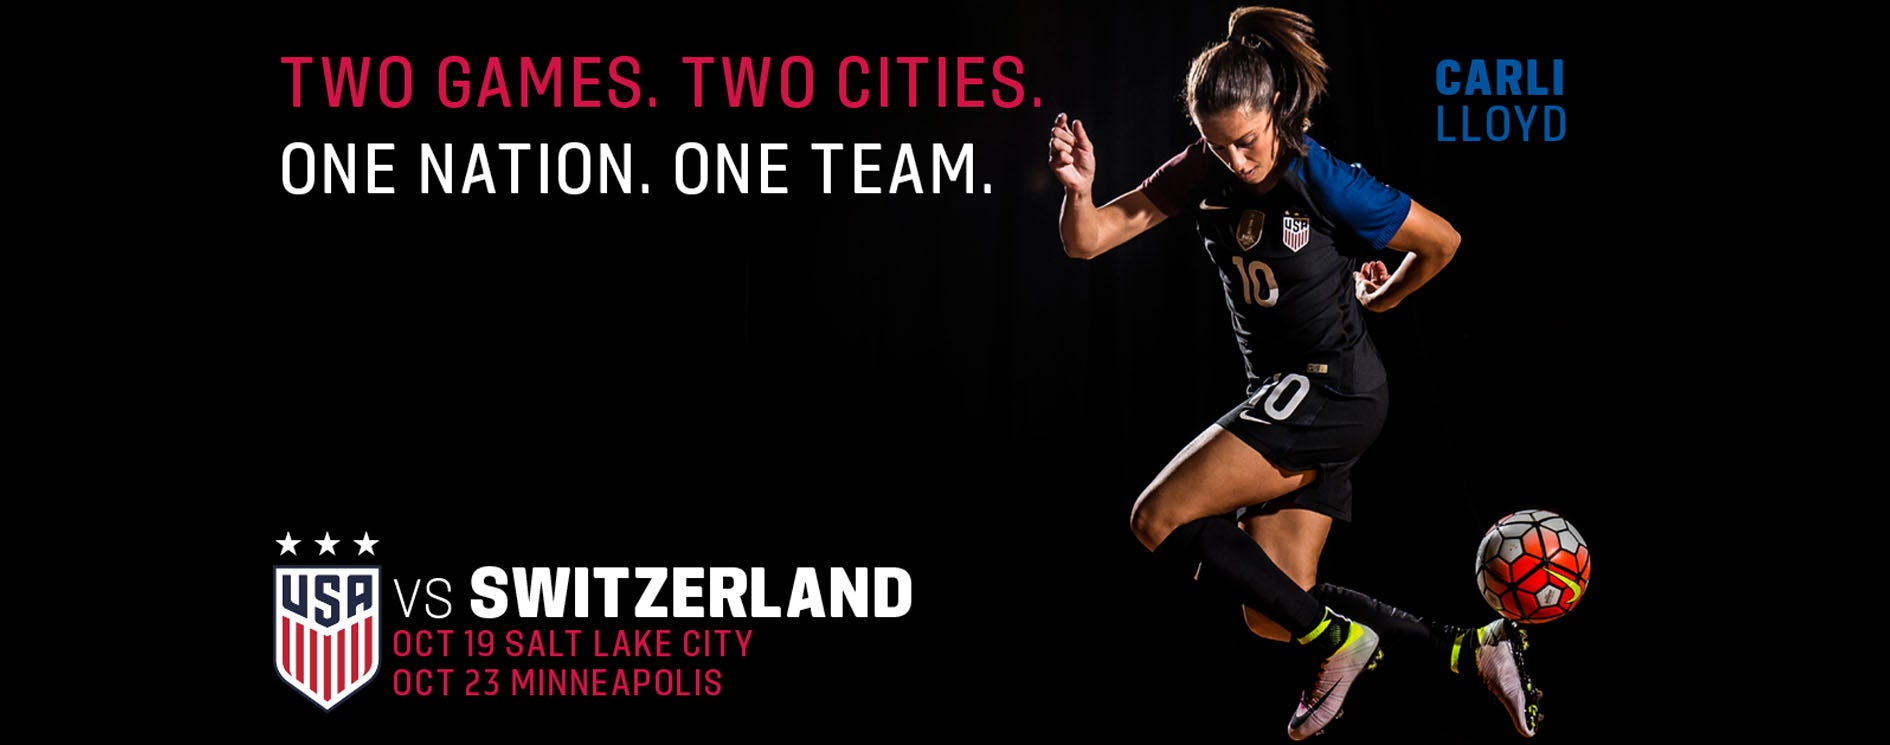 U S Women National Team Will Face Switzerland In A Friendly Match On Oct 23 Minneapolis